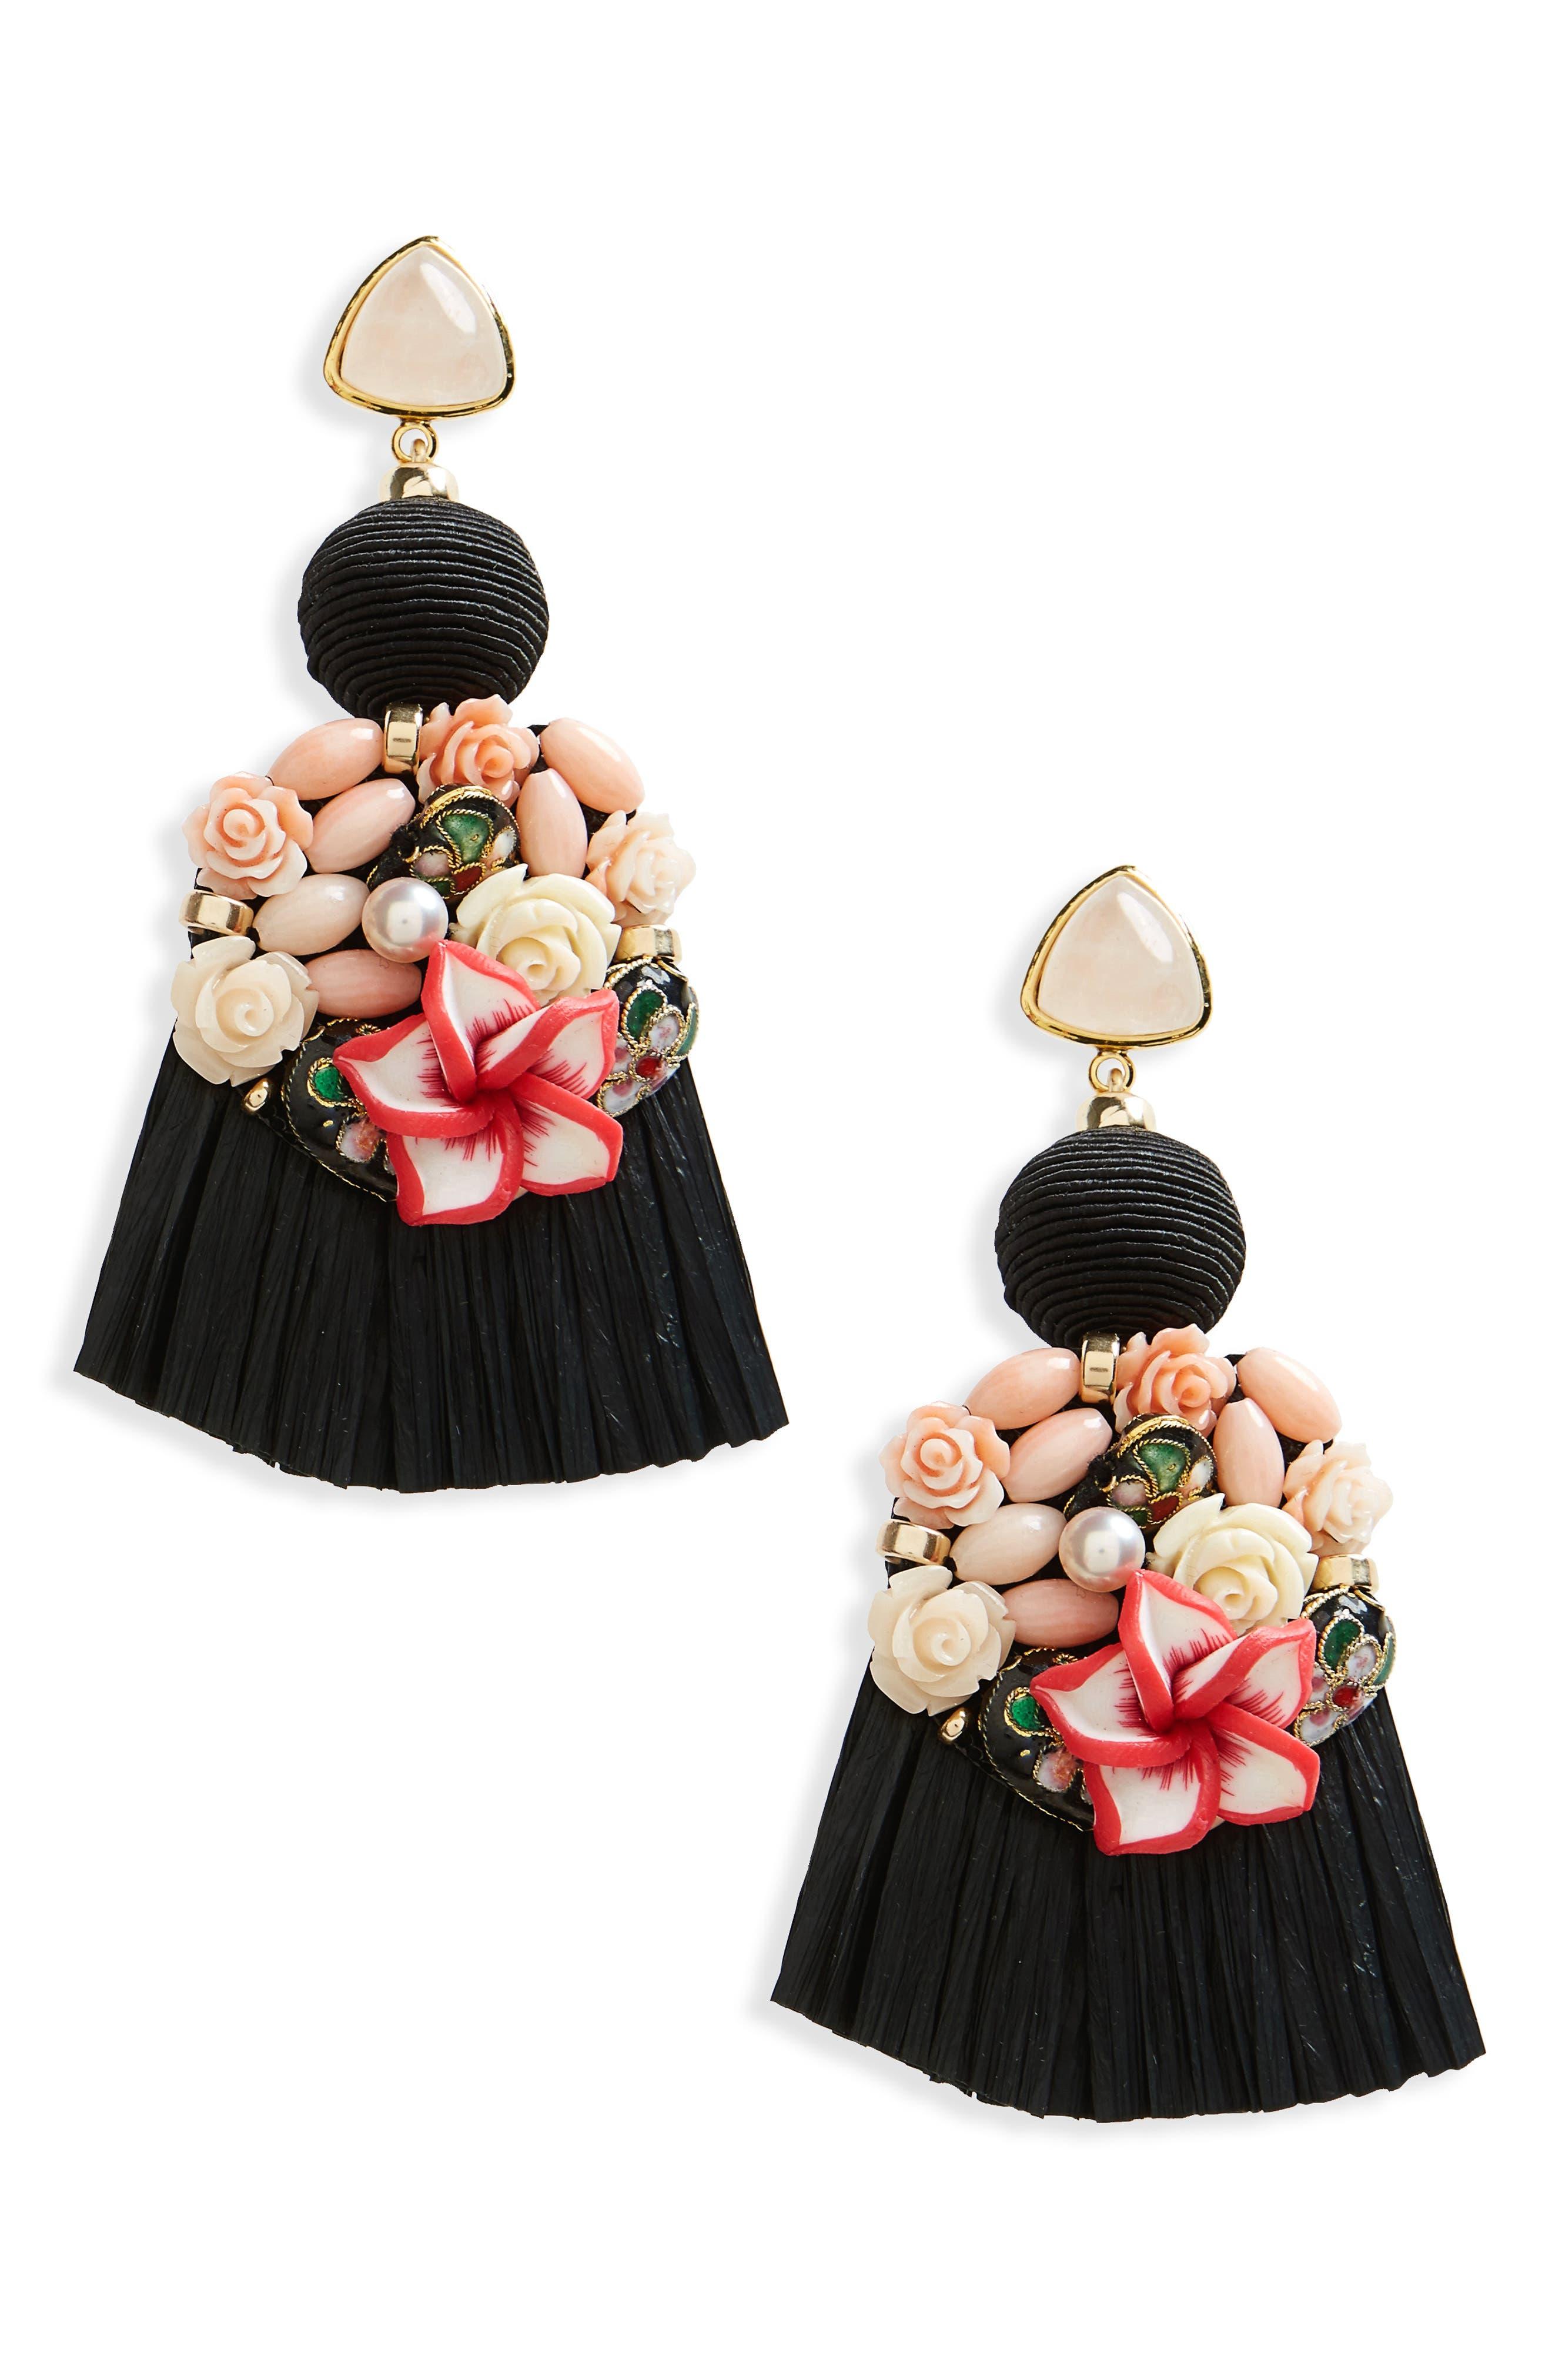 Alternate Image 1 Selected - Lizzie Fortunato Dolce Vita Tassel Drop Earrings